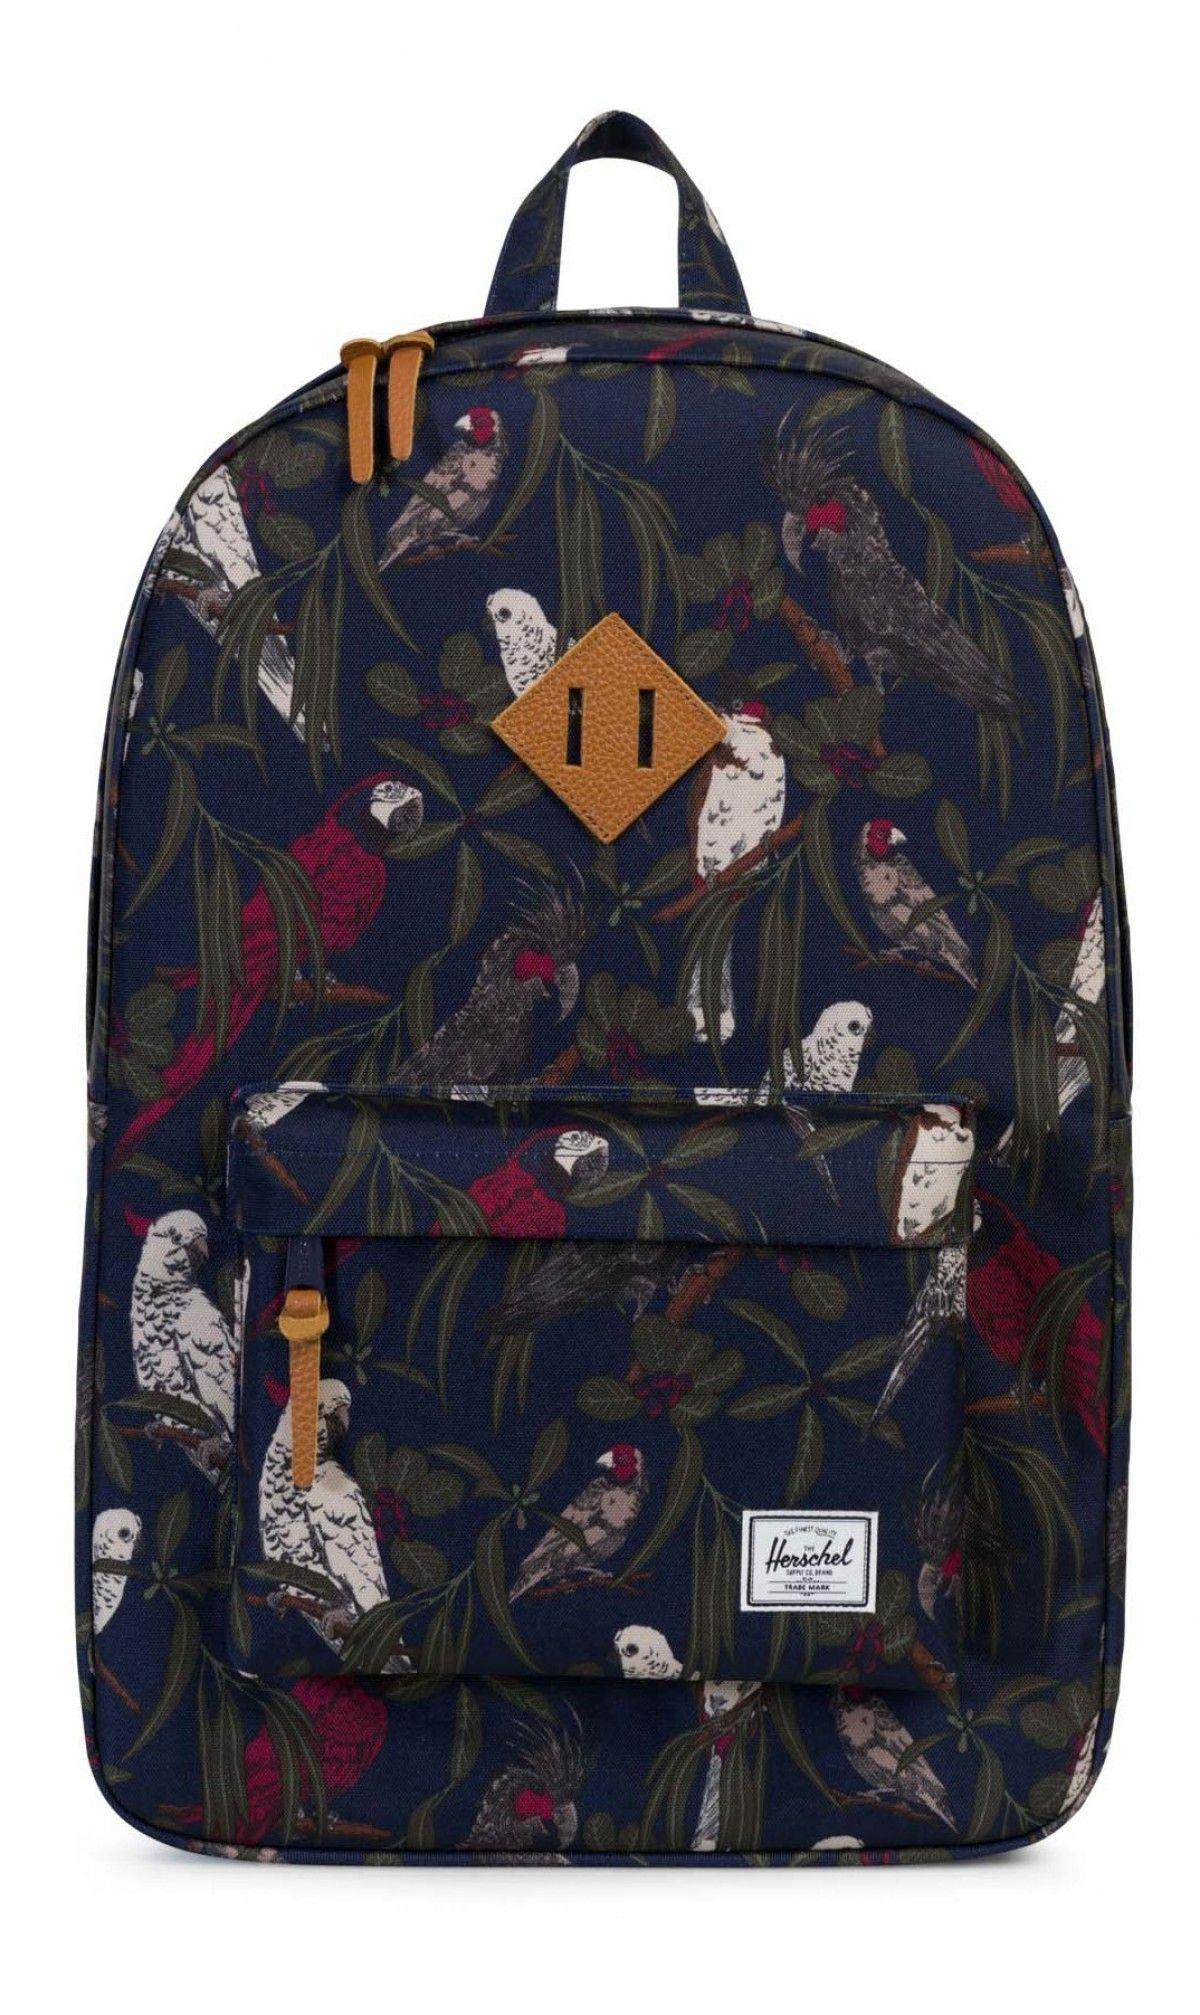 Herschel Heritage Backpack 600D Poly Peacoat Parlor  1678826aec484